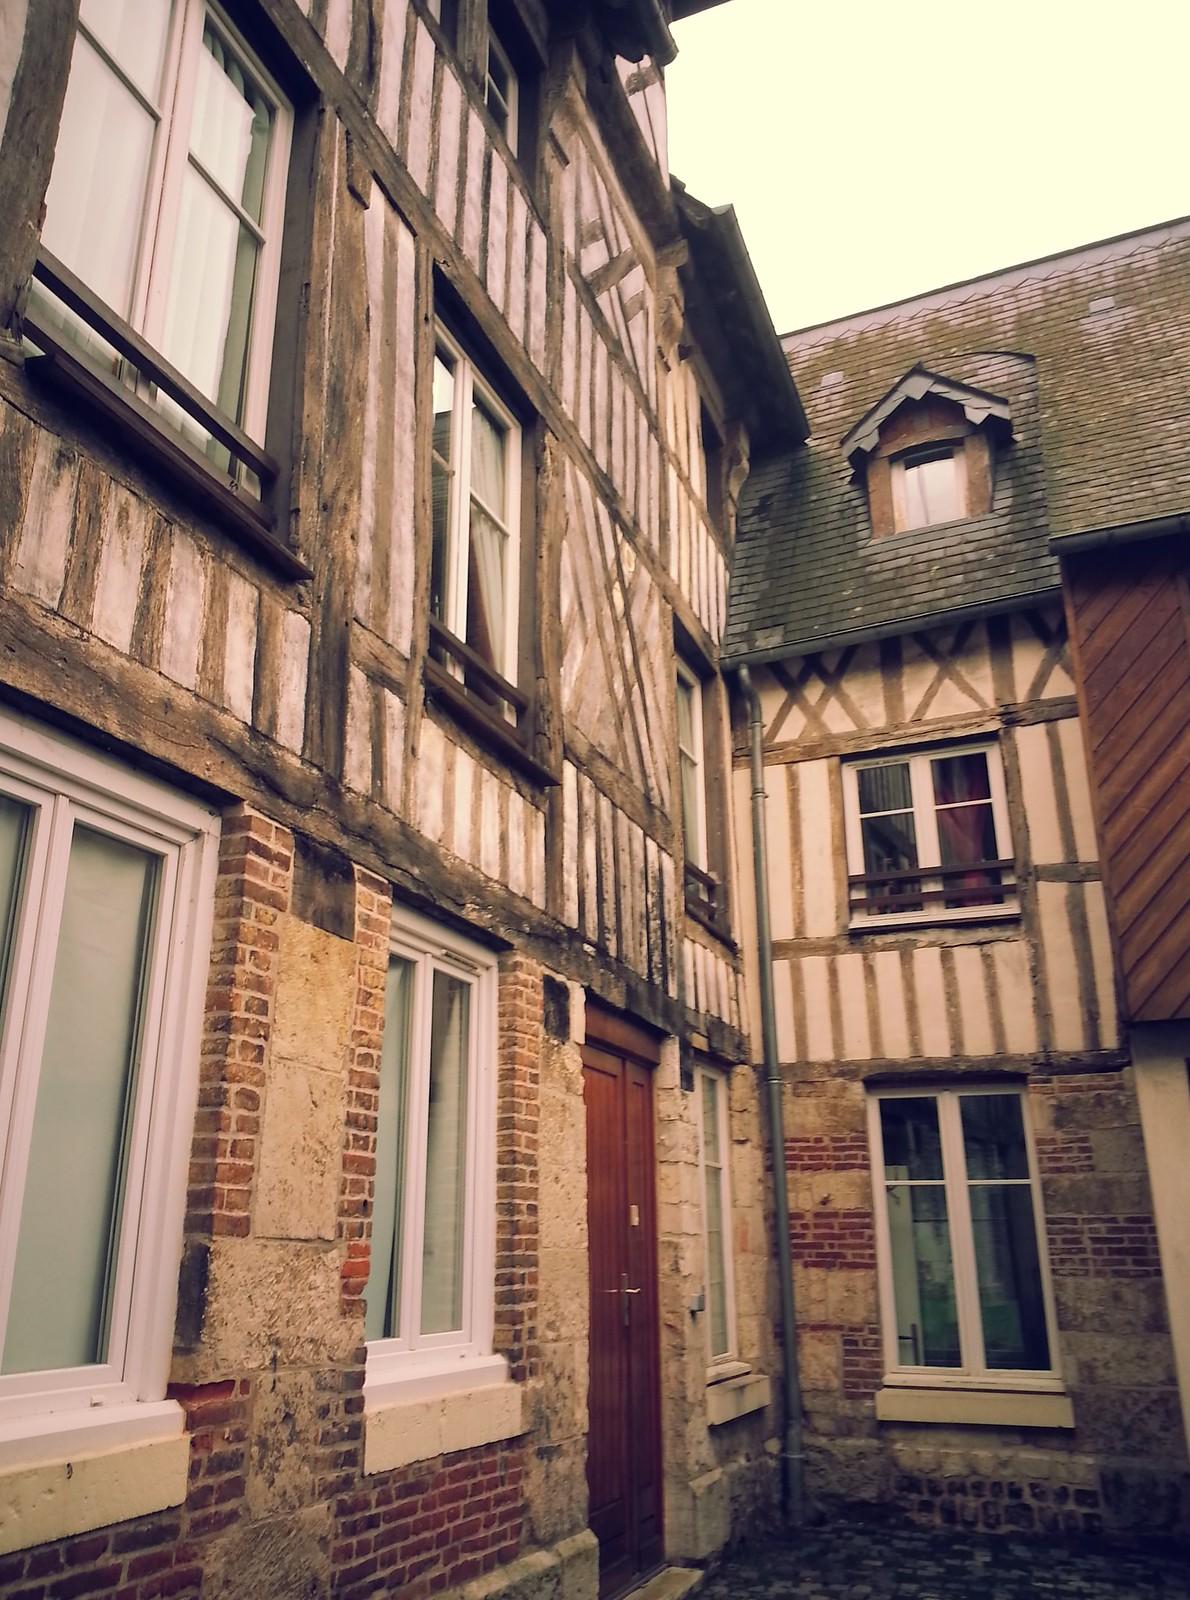 12-16-15 (Caudebec-en-Caux) Old buildings.